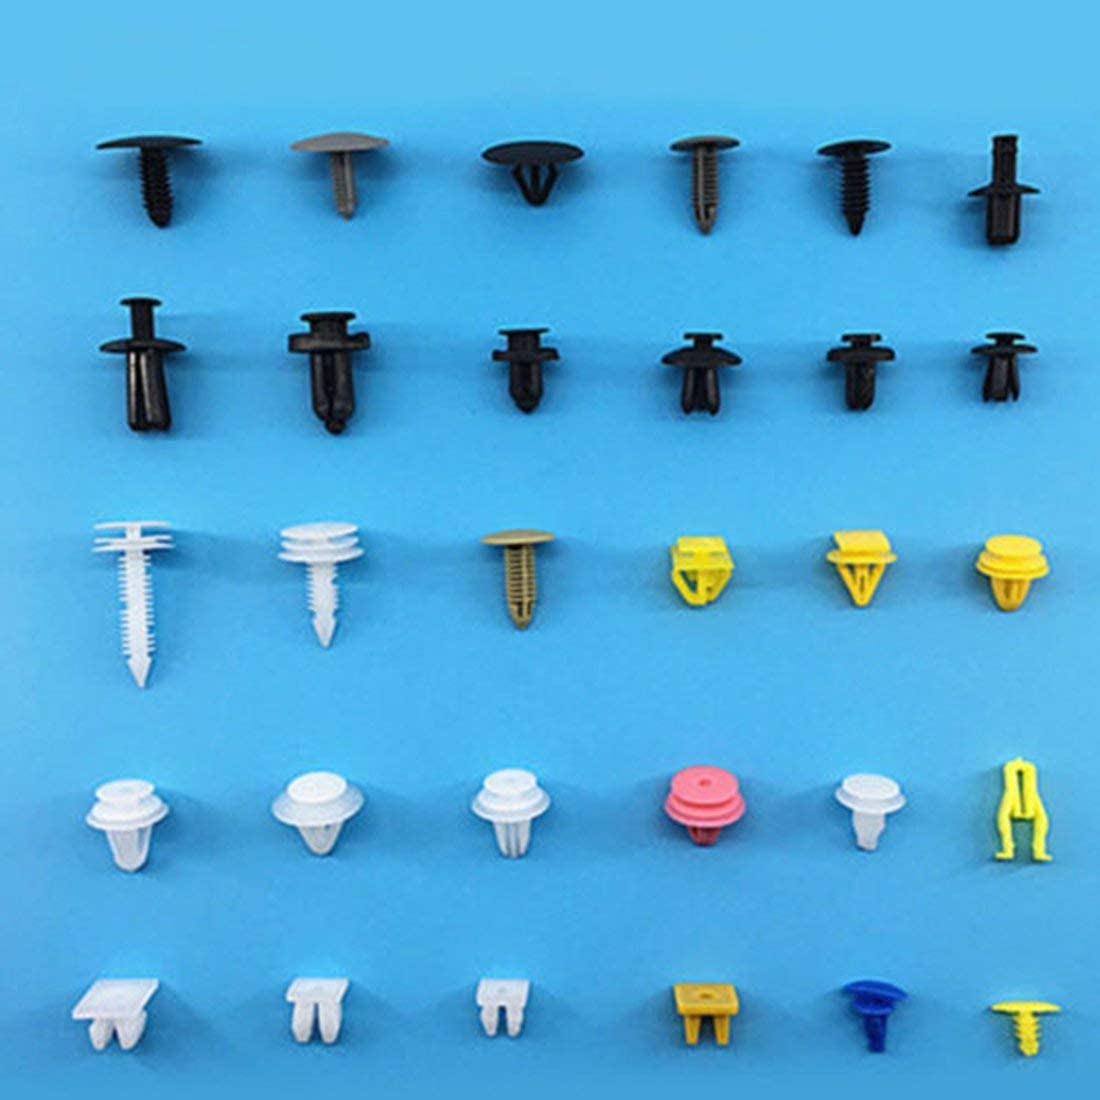 Universal Auto Body Clips de moldura Clips de retenci/ón de empuje de pl/ástico Sujetadores de remache Kit de surtido de clips de retenci/ón de panel Color de mezcla